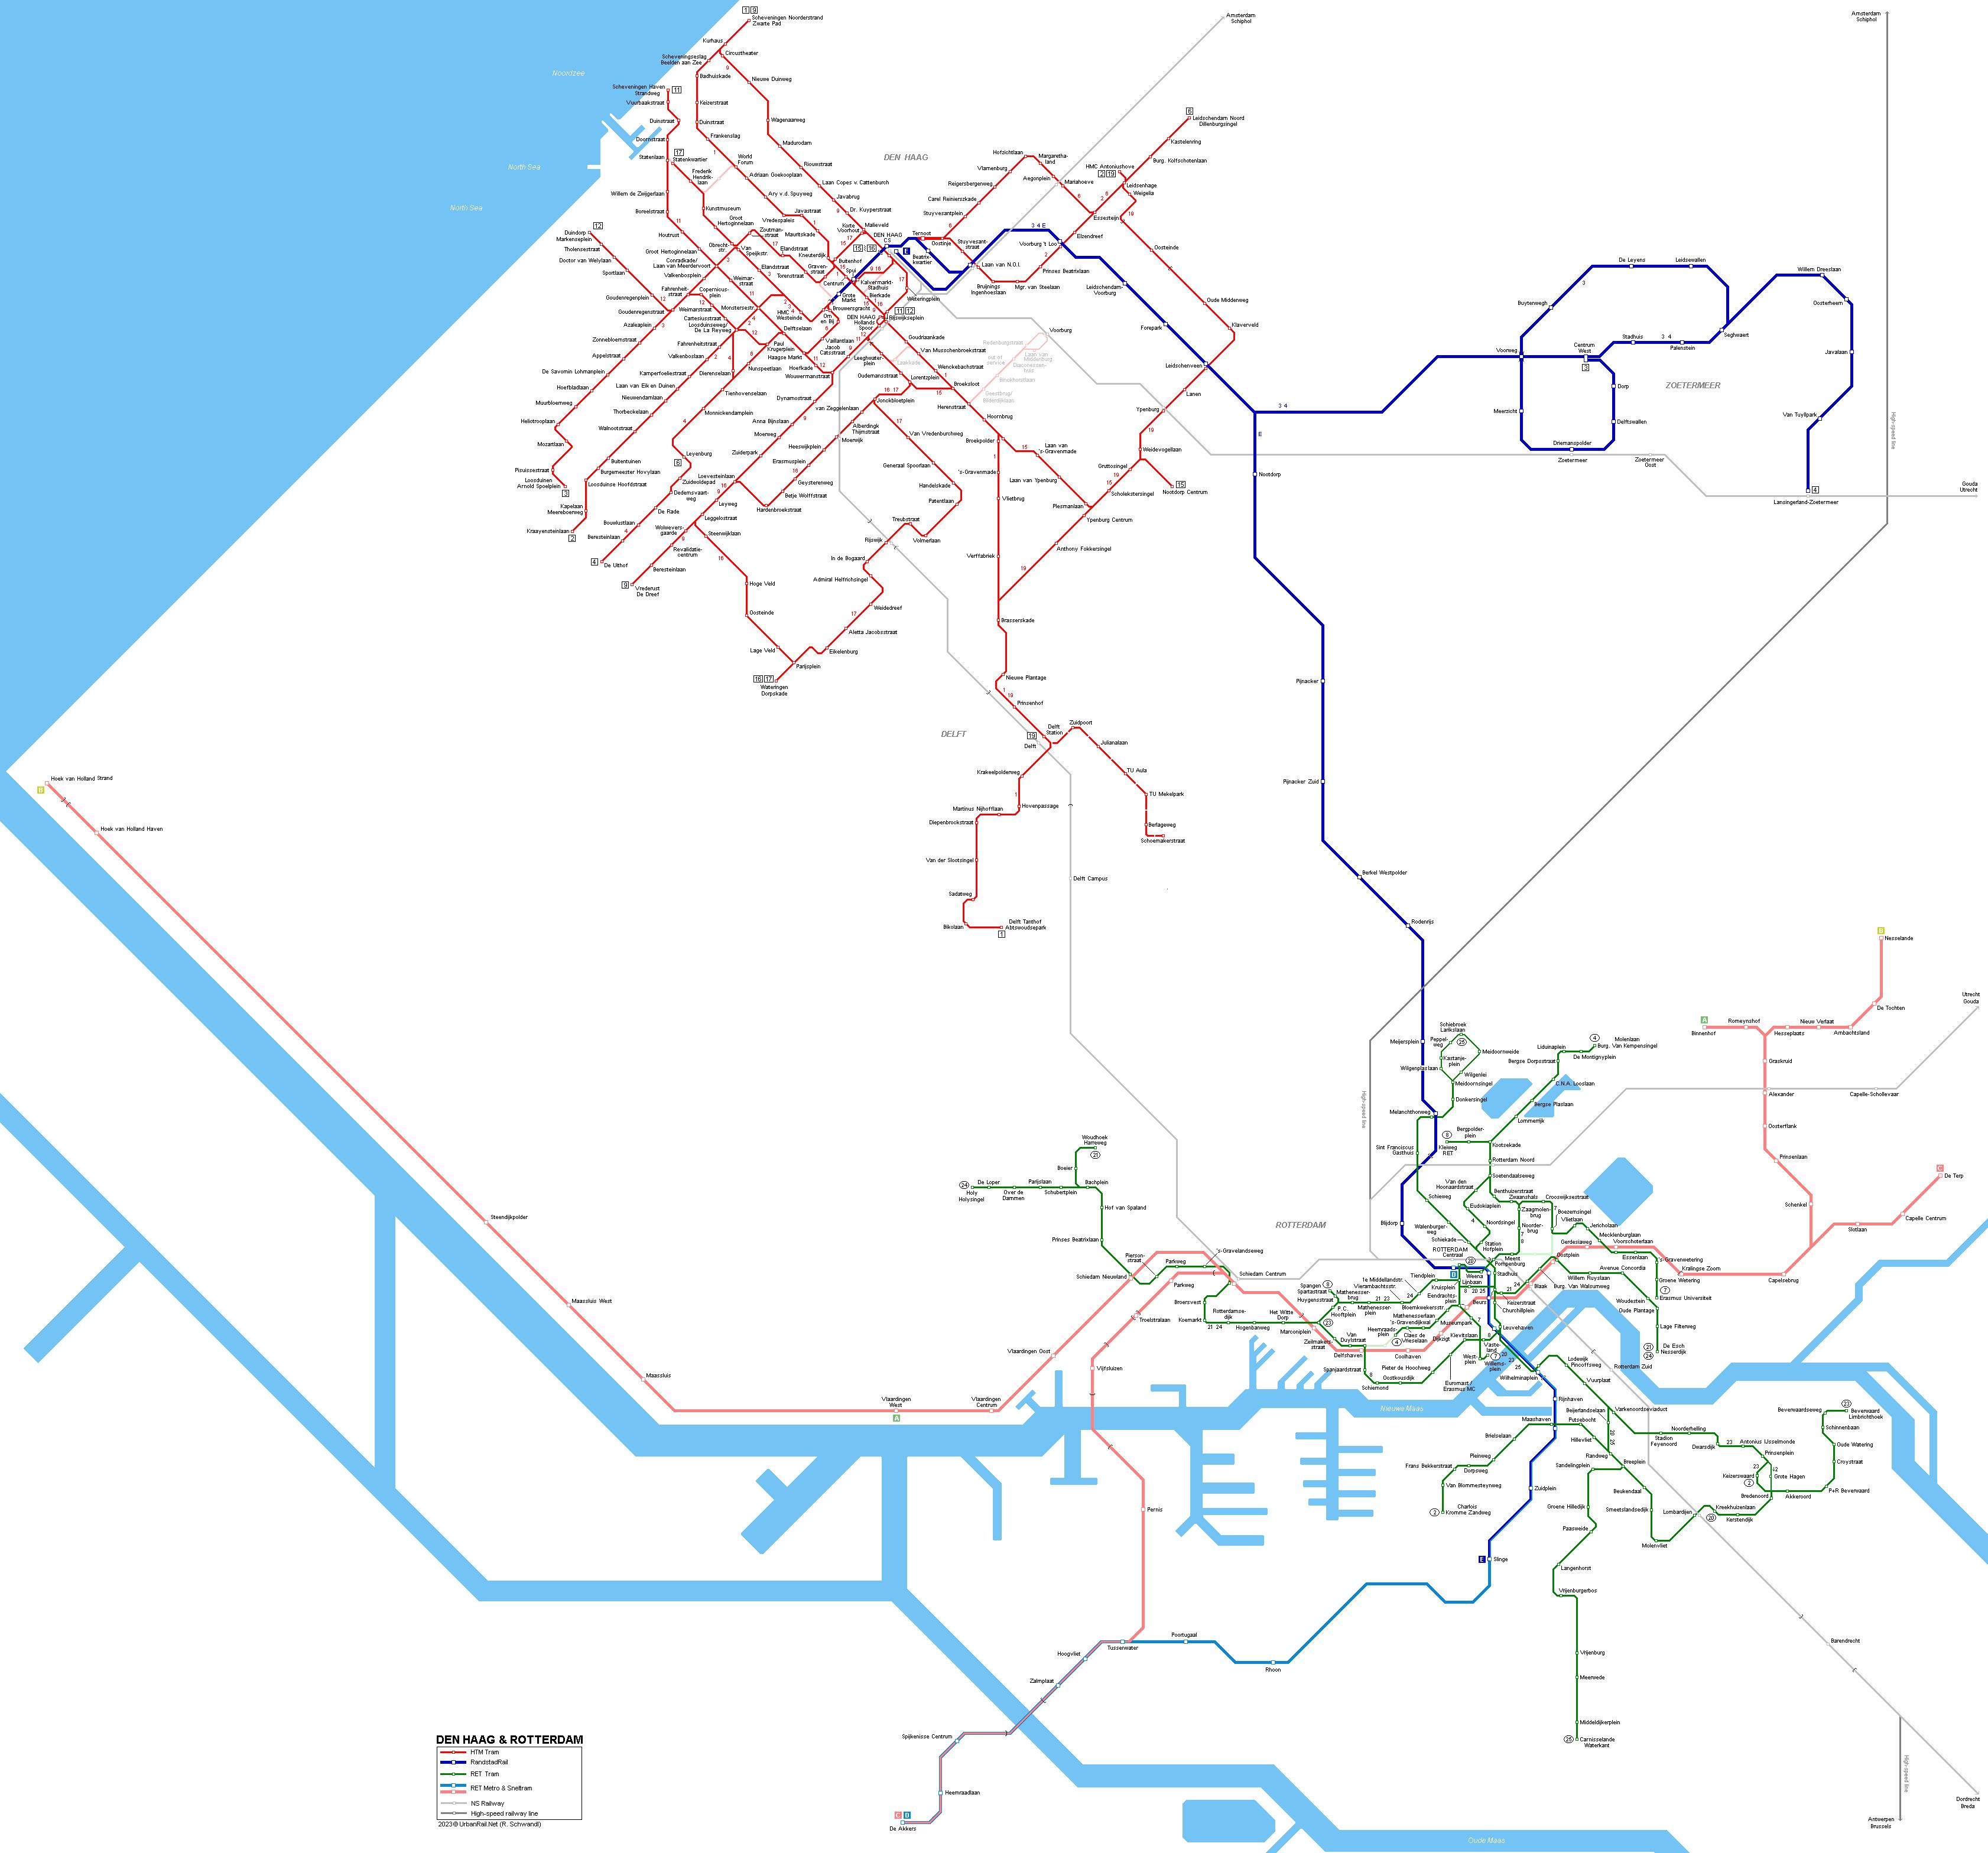 UrbanRailNet Den Haag Rotterdam Tram Metro Network Map